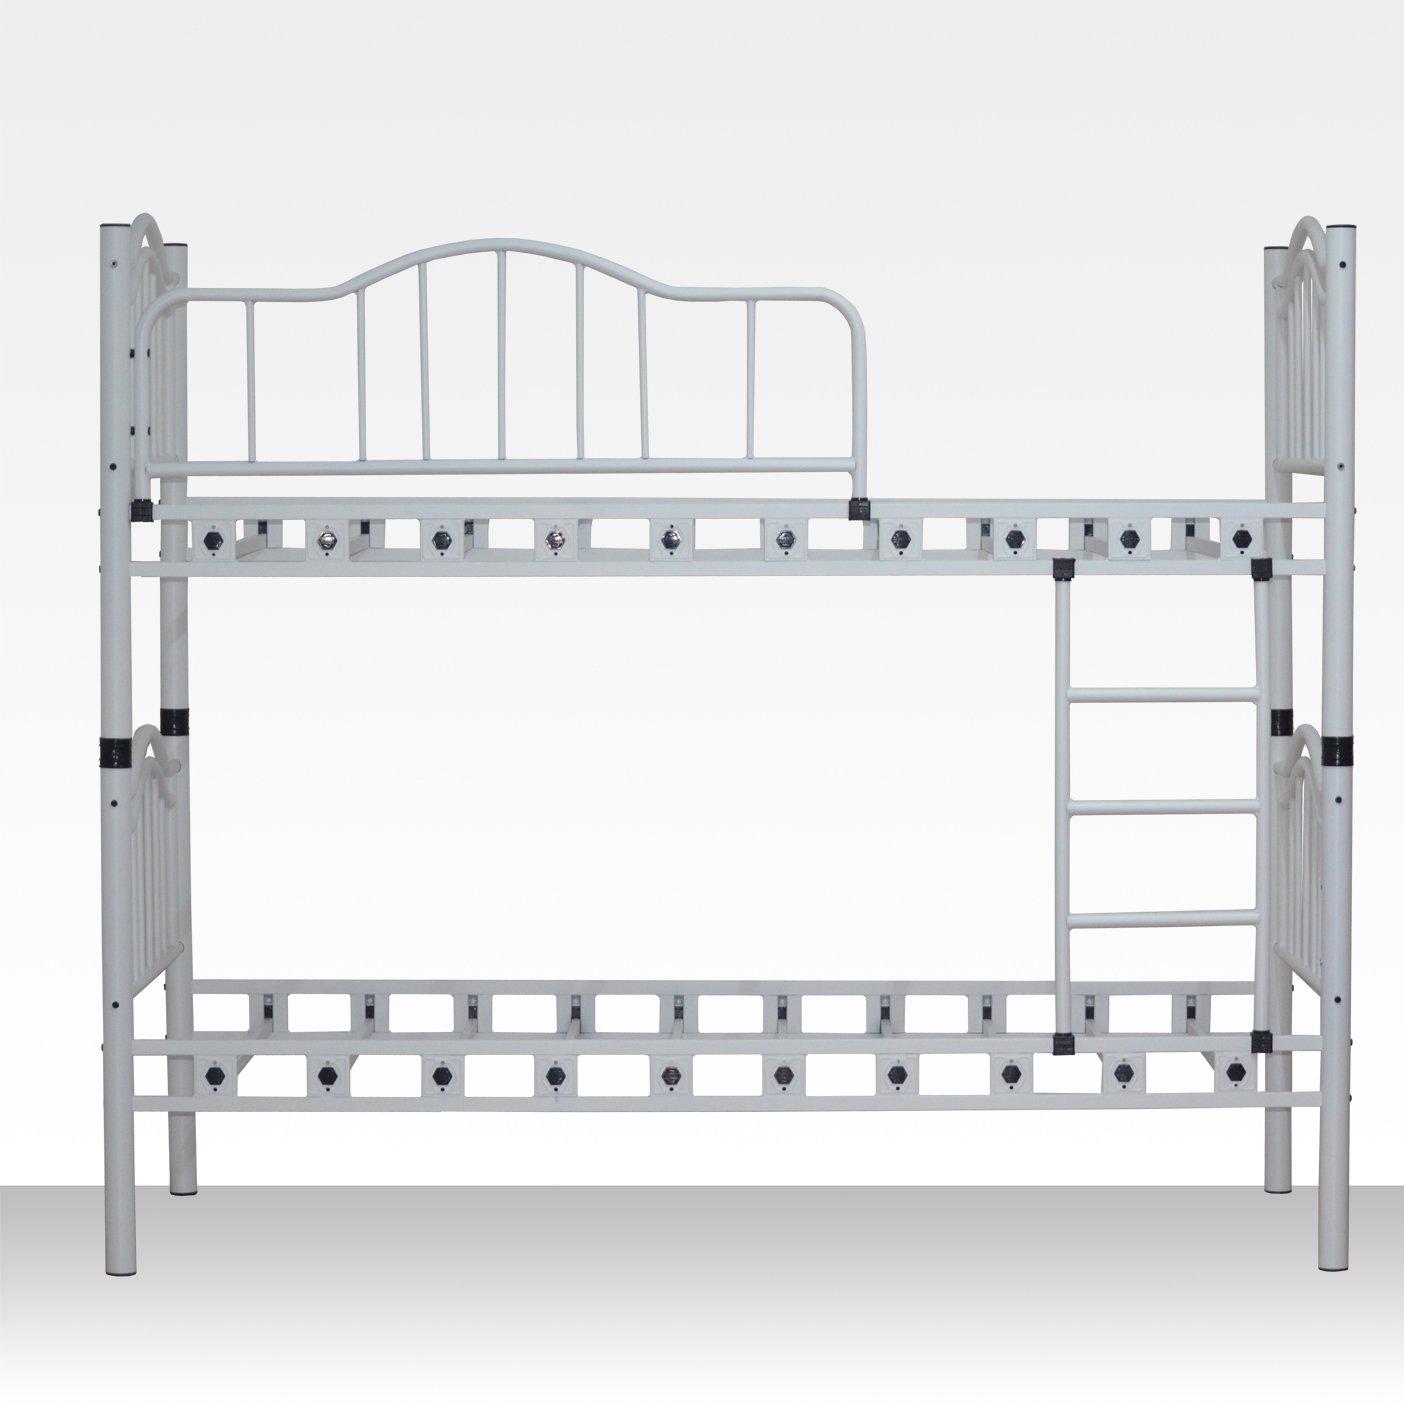 Metall-Etagenbett Adara, 90cm x 200cm Weiß stabile Konstruktion